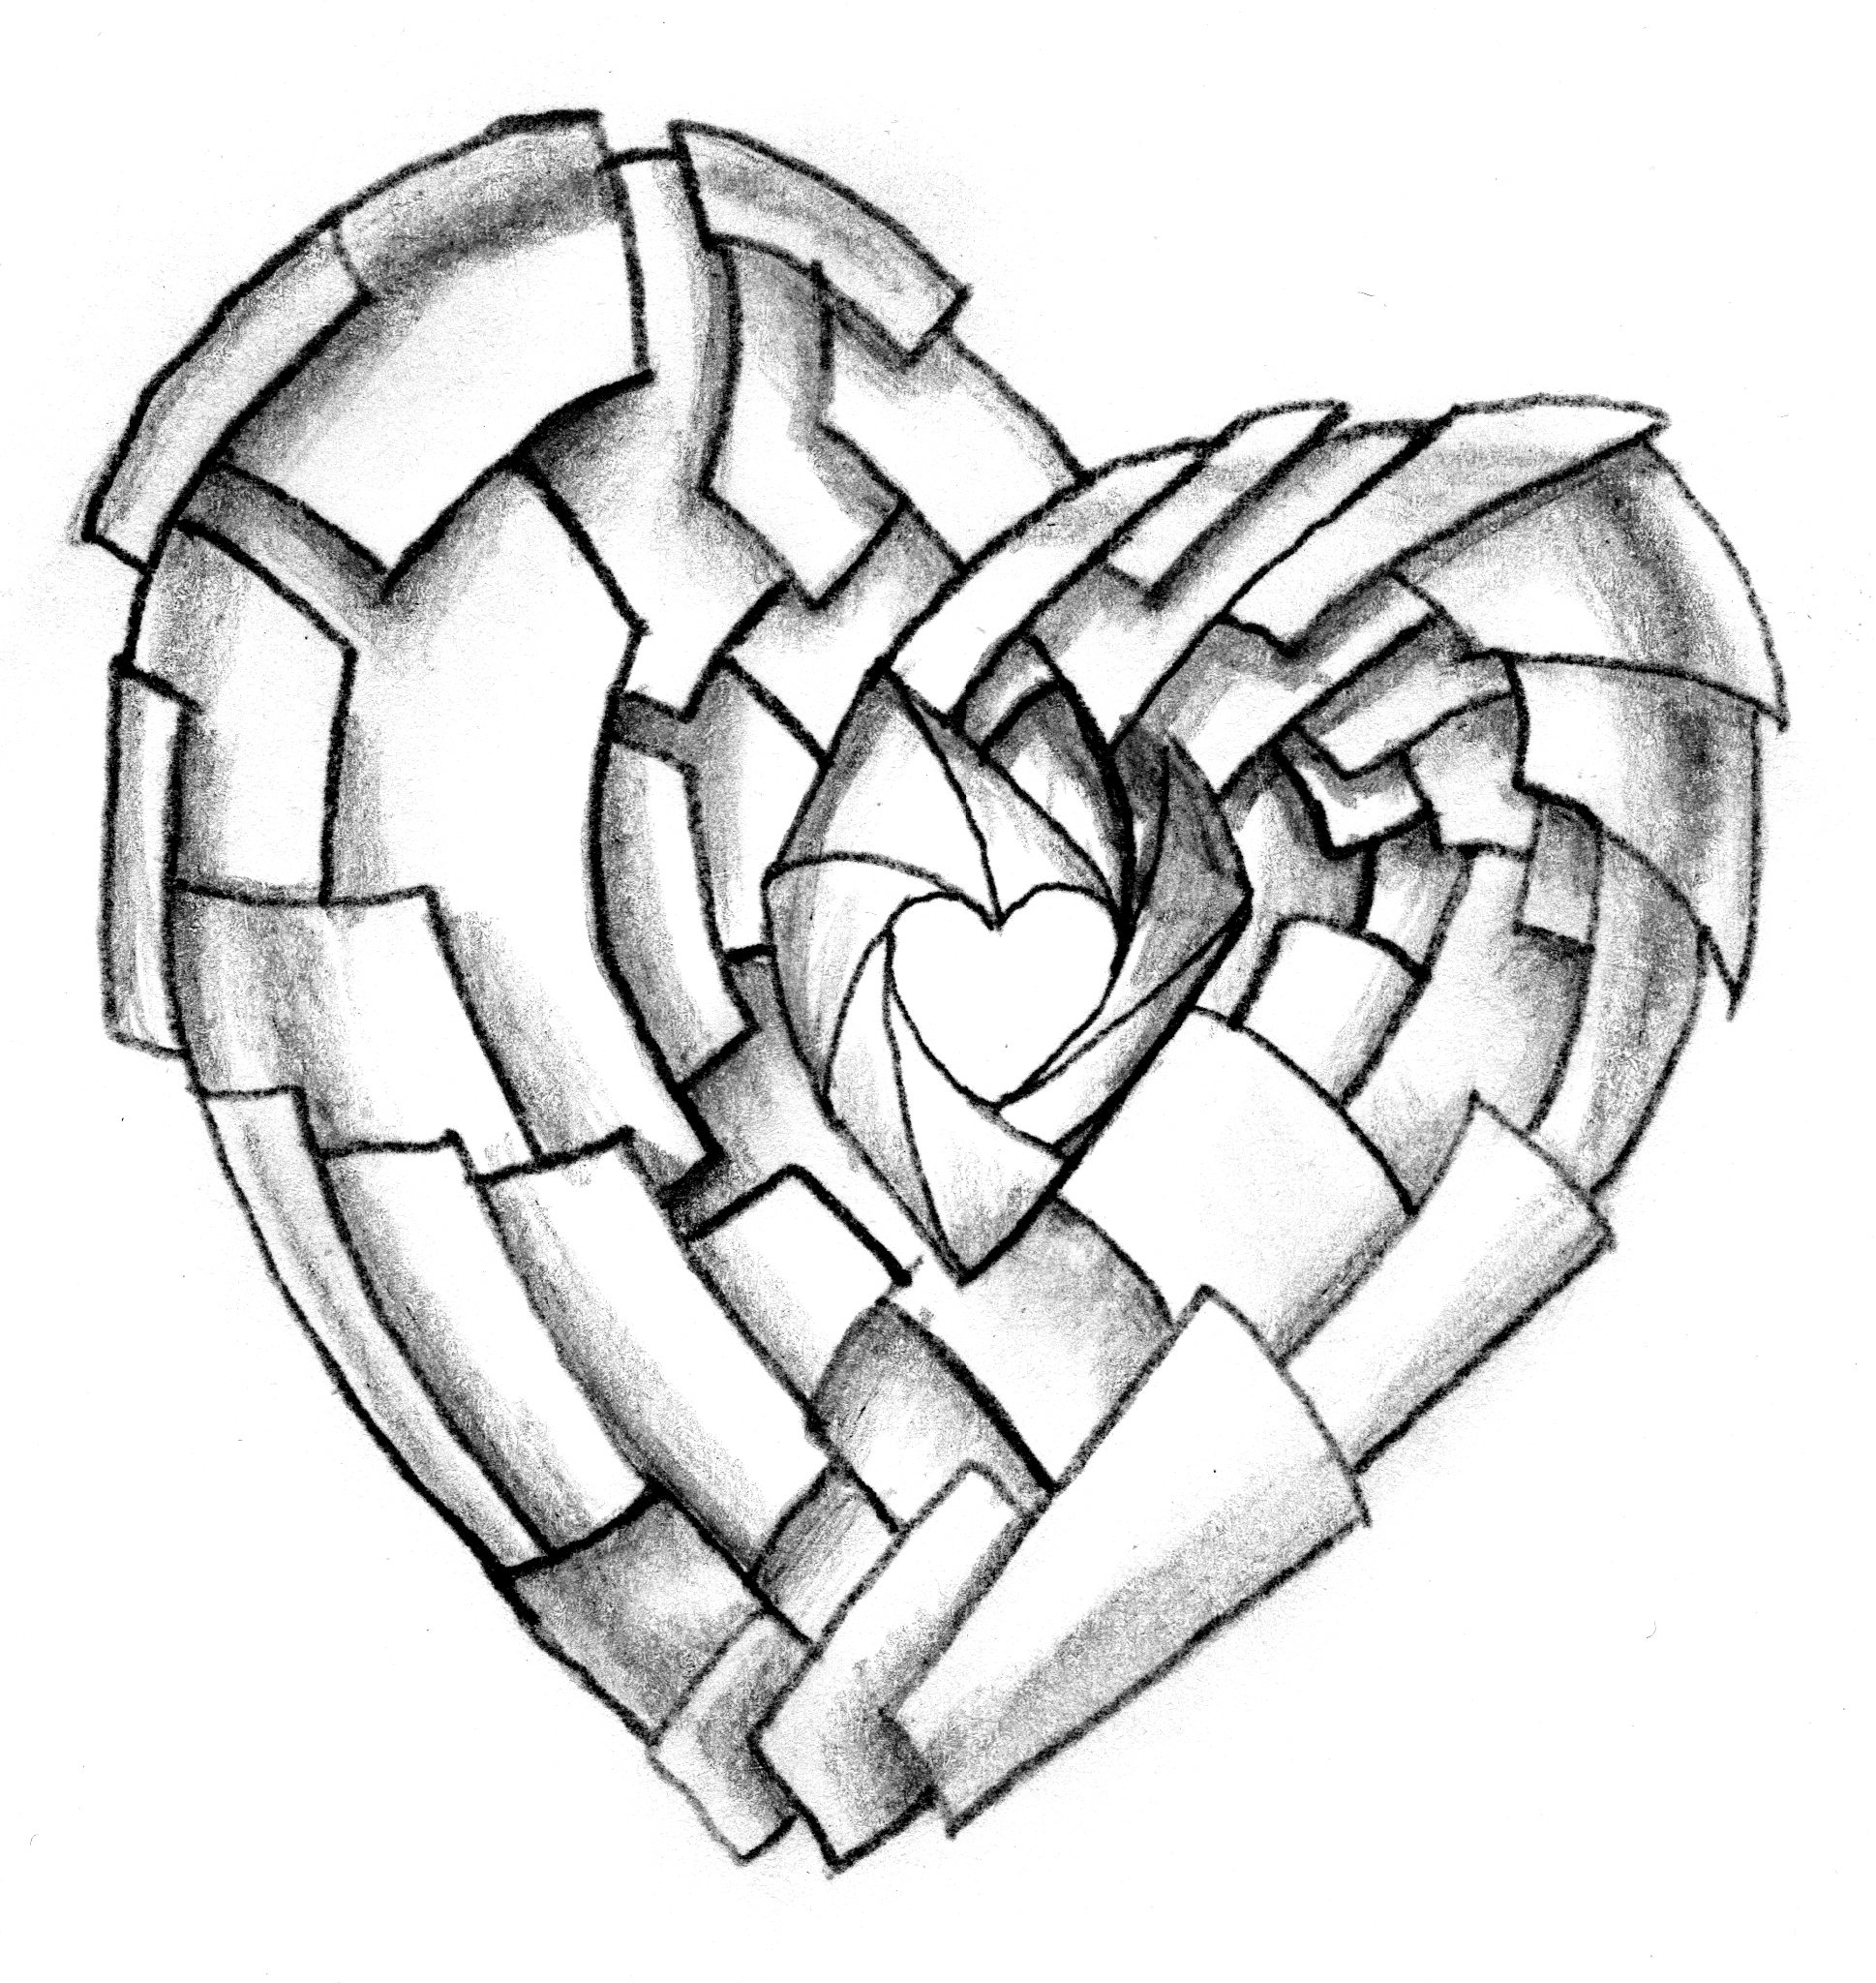 Love Heart Drawings Free Download Best Love Heart Drawings On